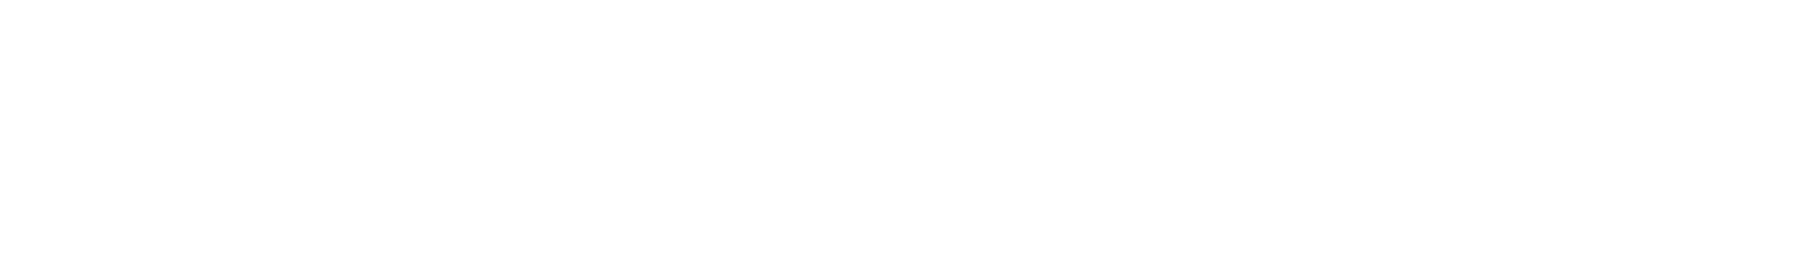 vox 027